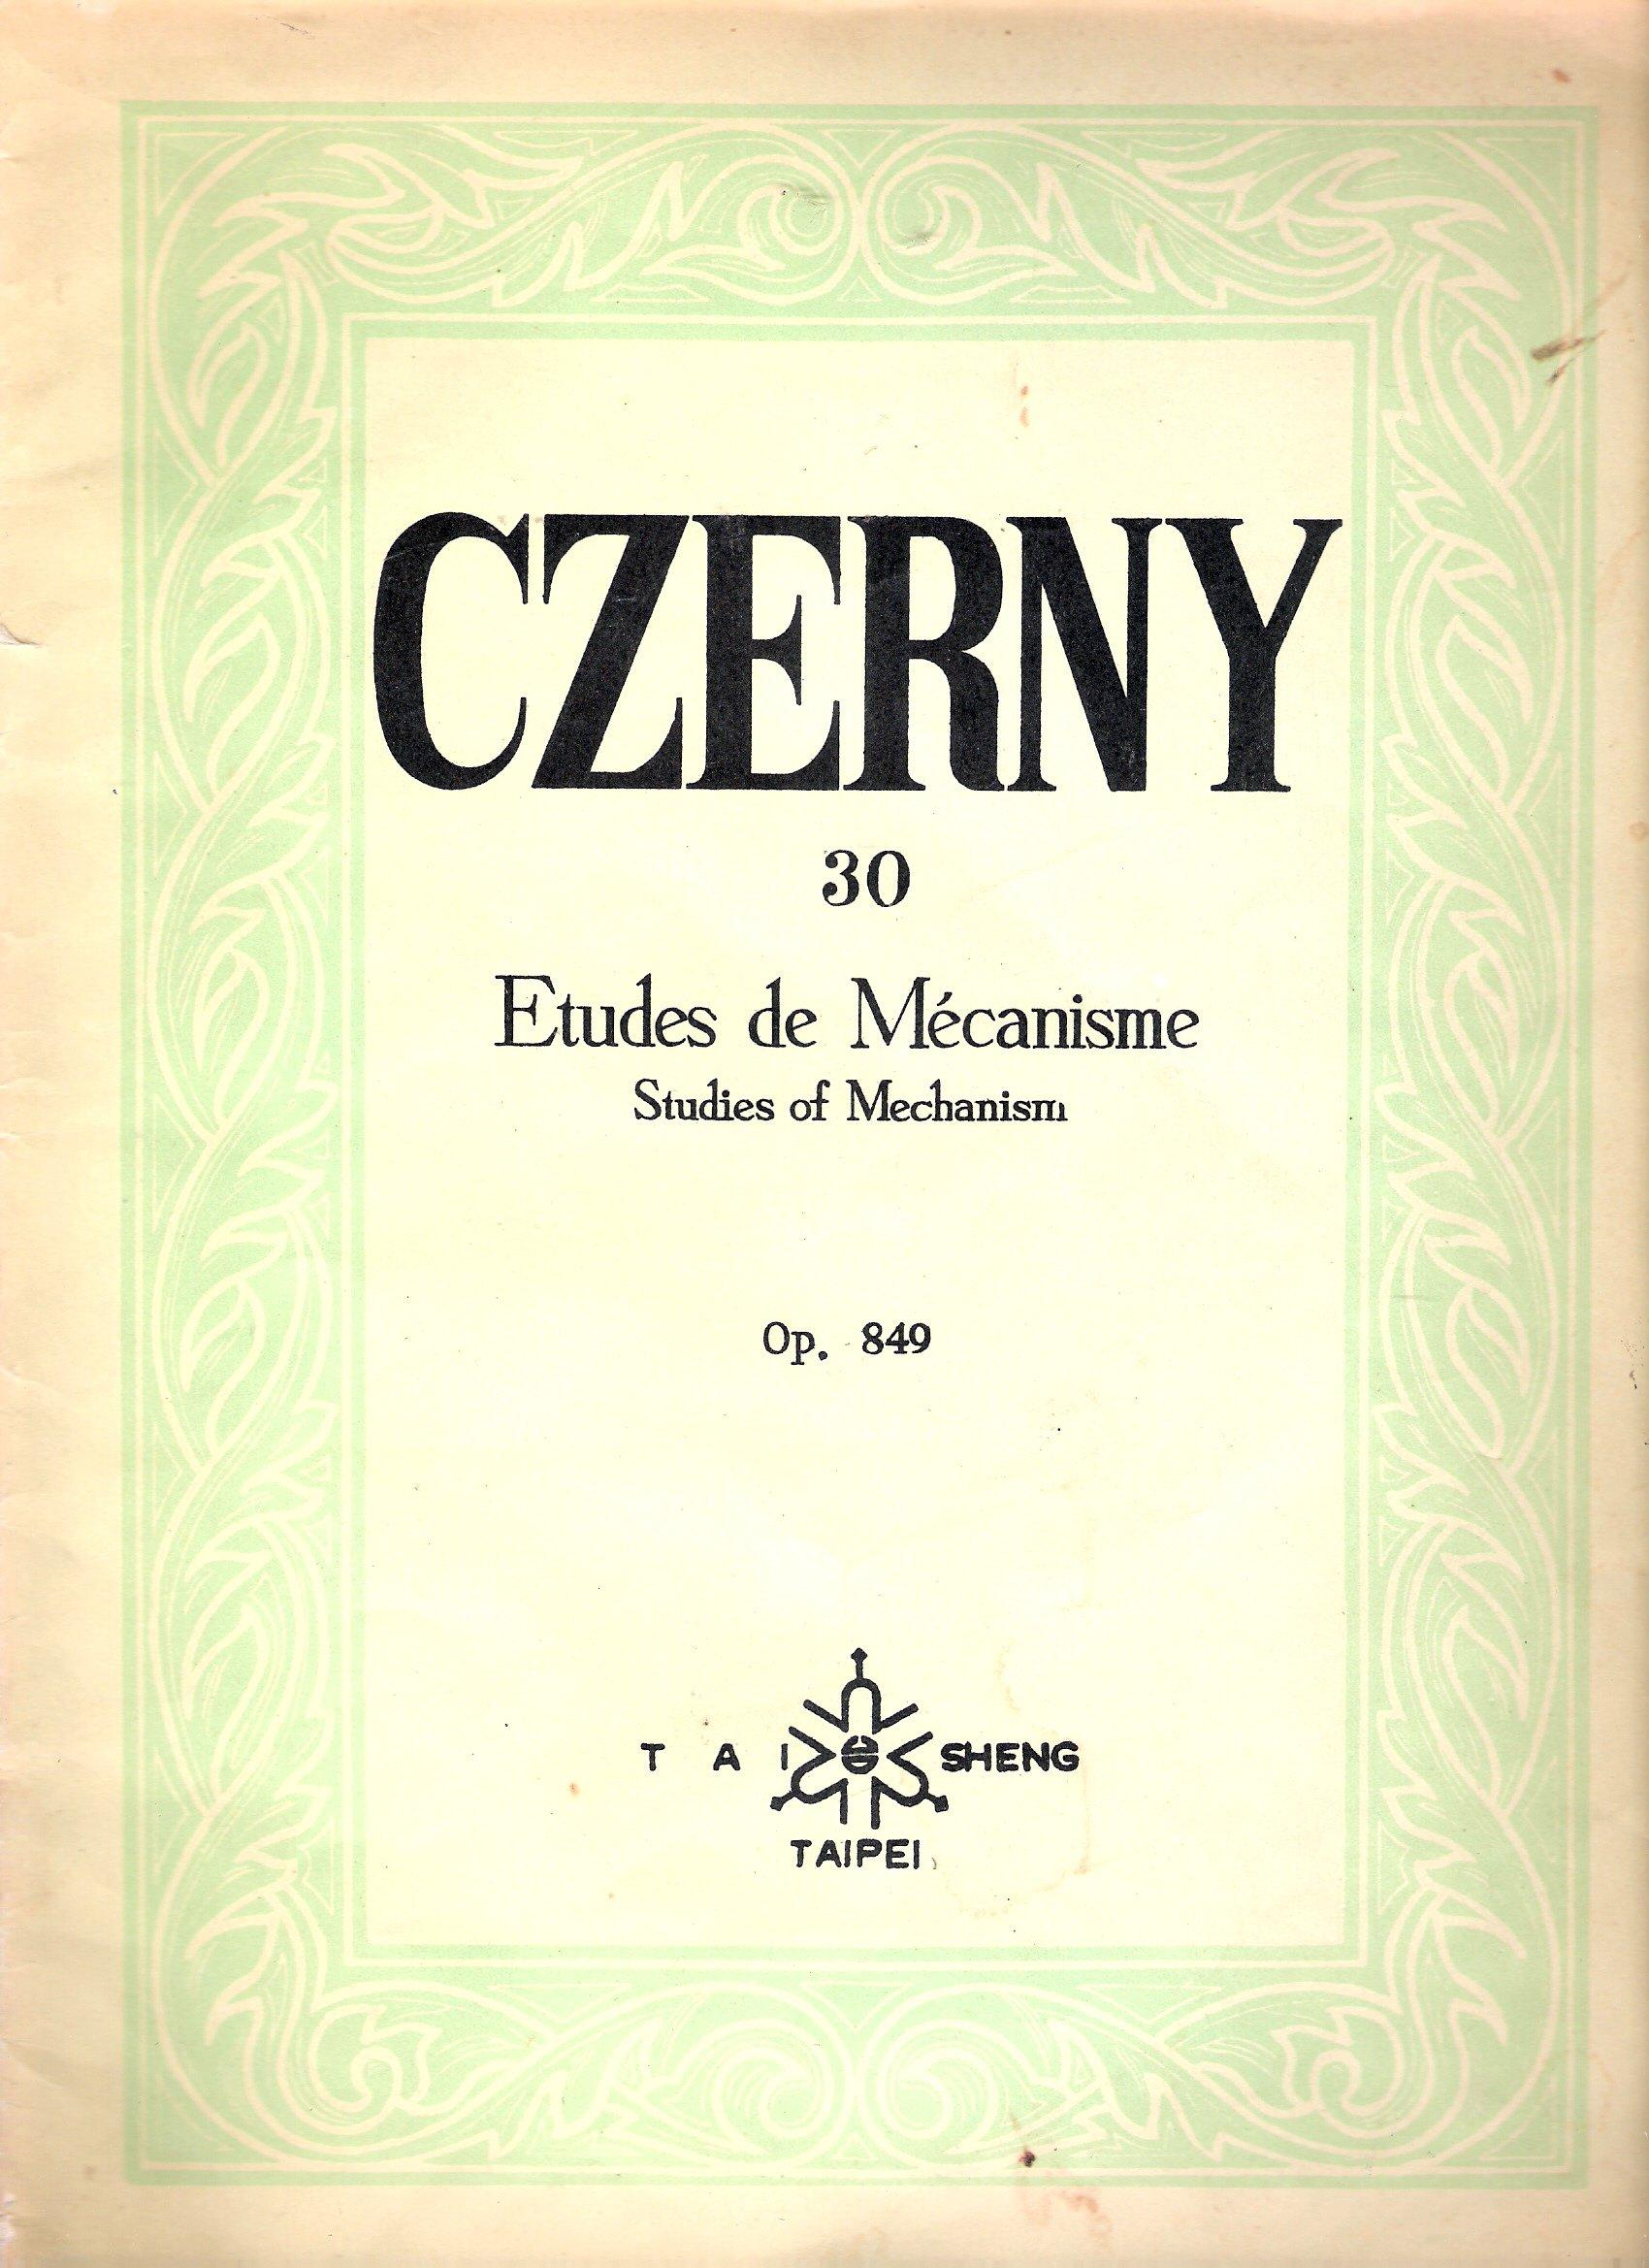 Master Czerny 30 etudes (Korean edition) ebook